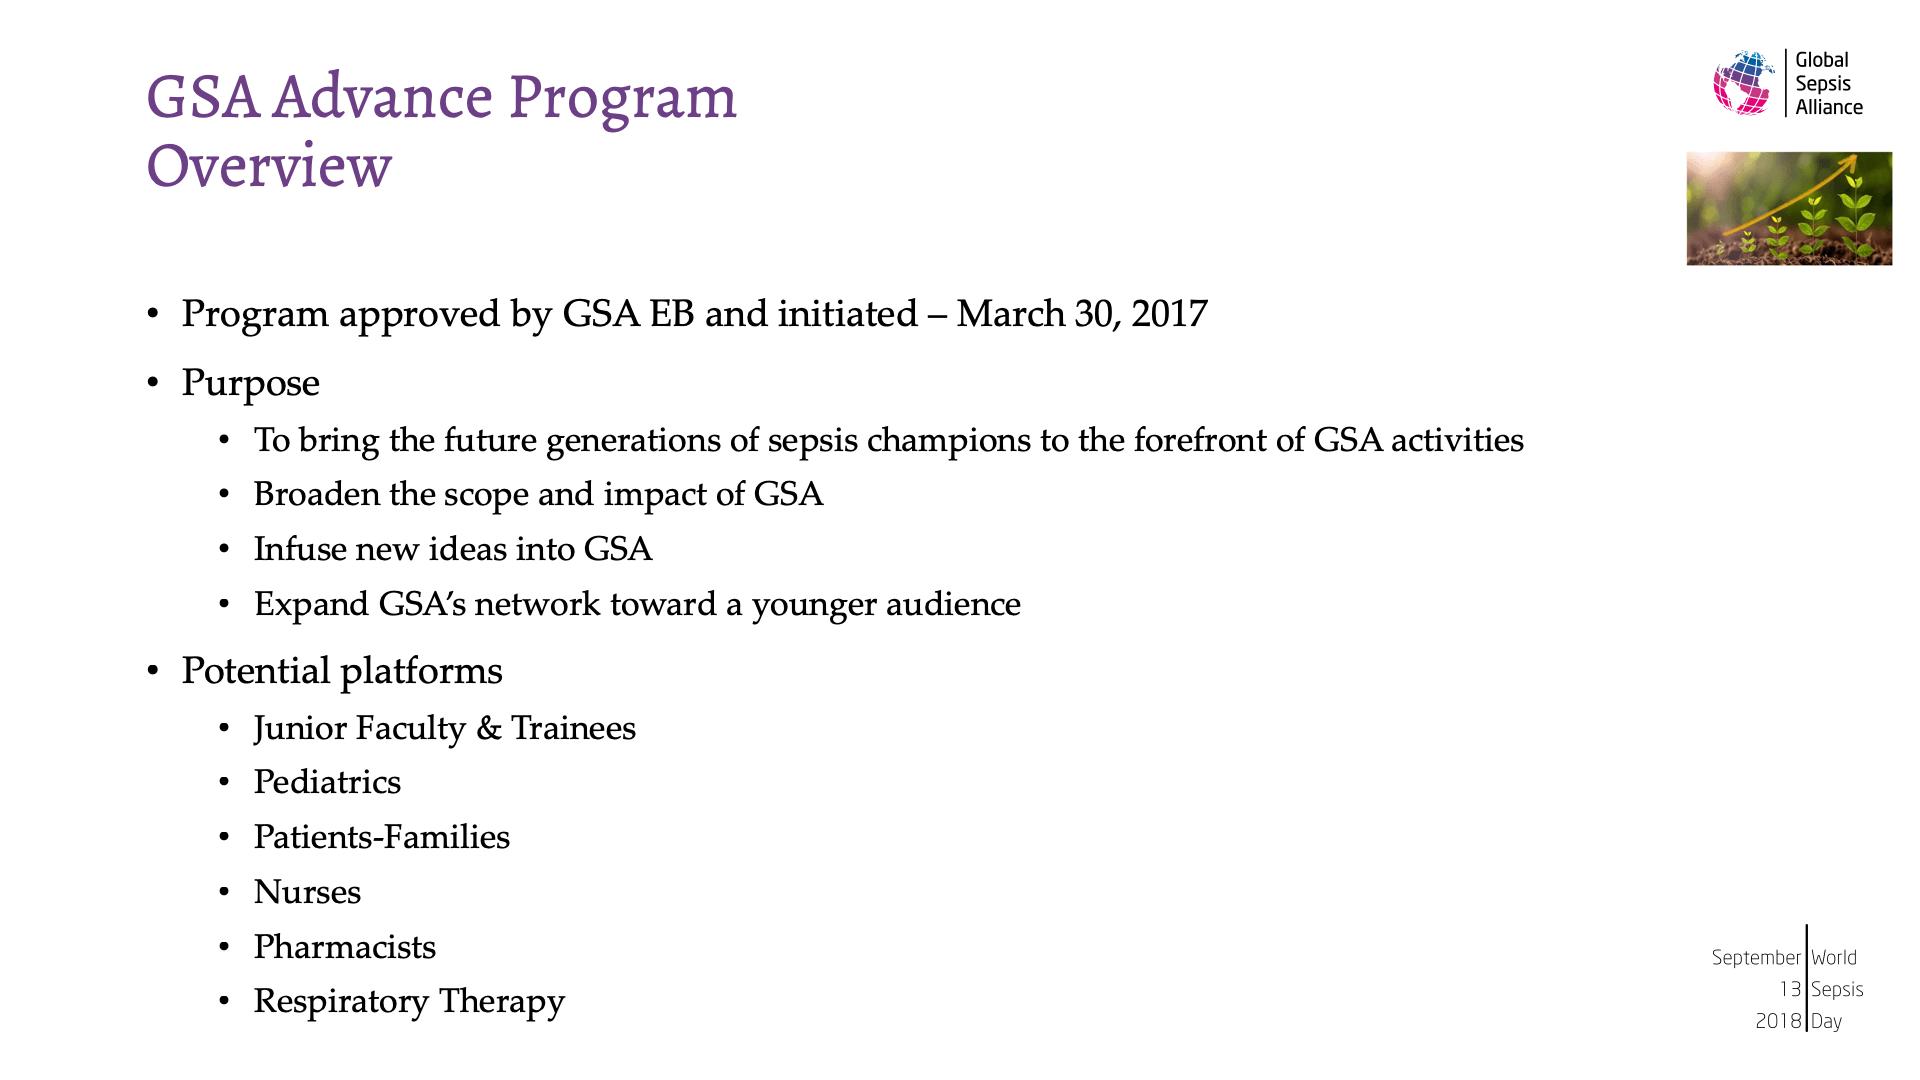 GSA Advance ESICM 2018 3.png